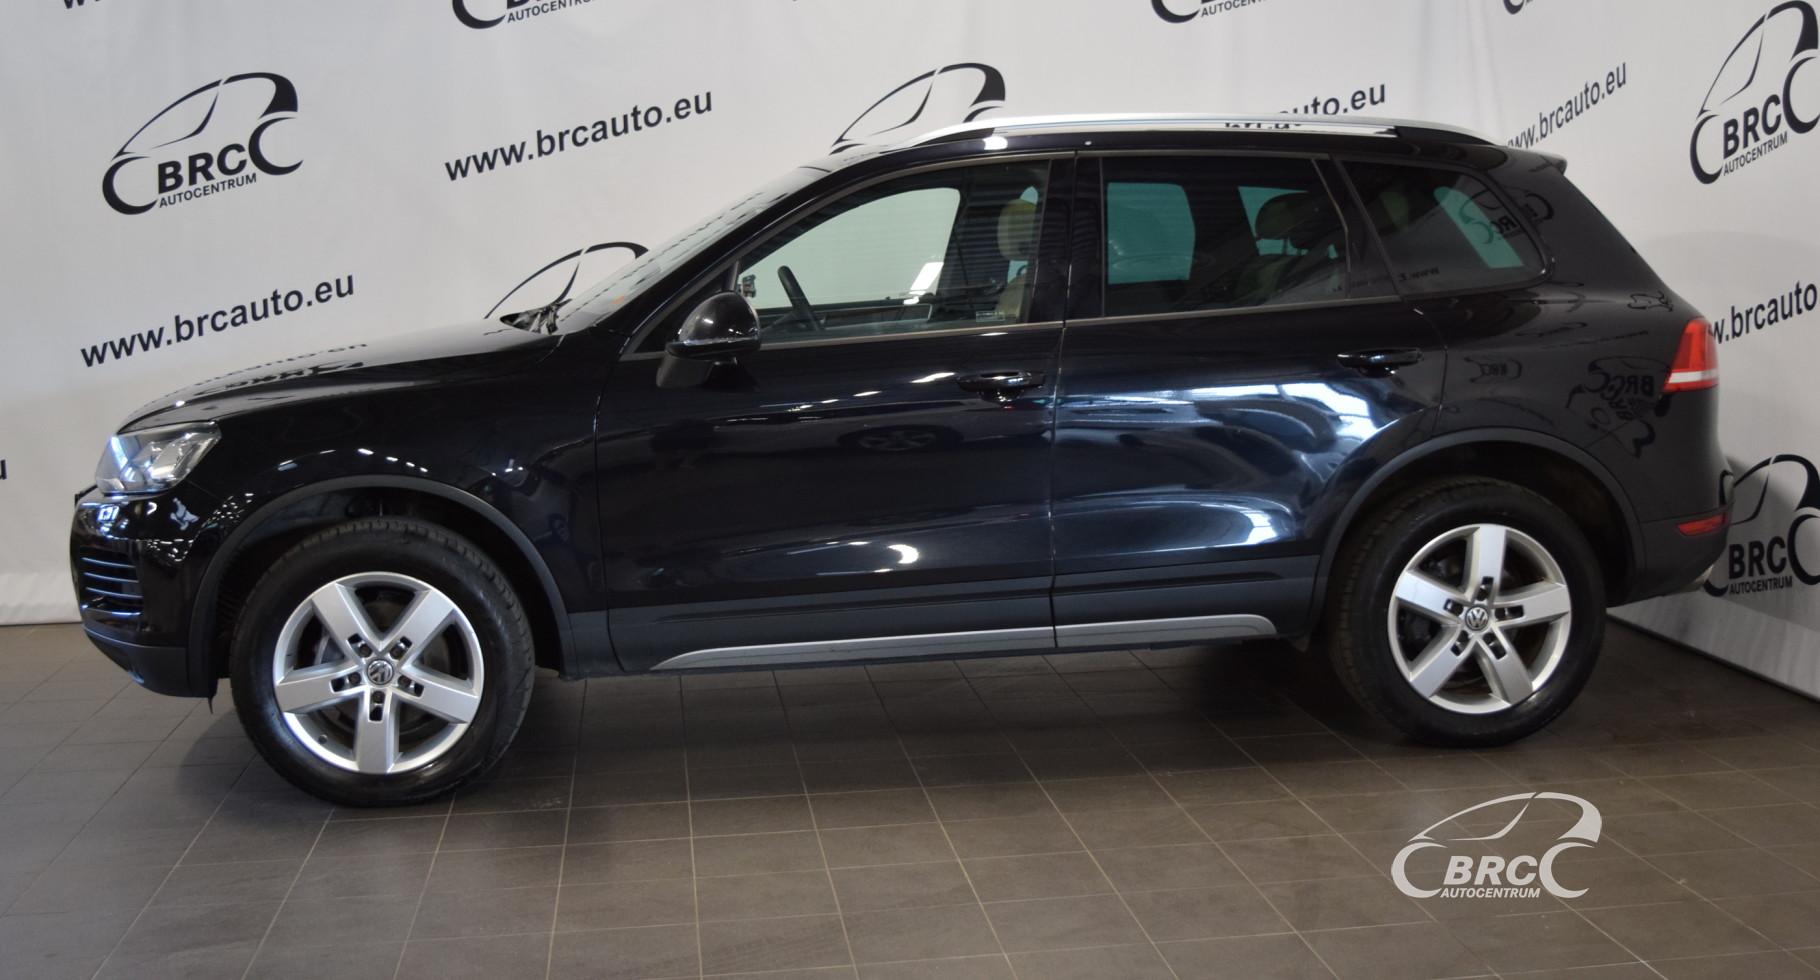 Volkswagen Touareg Exclusive V6 TDi